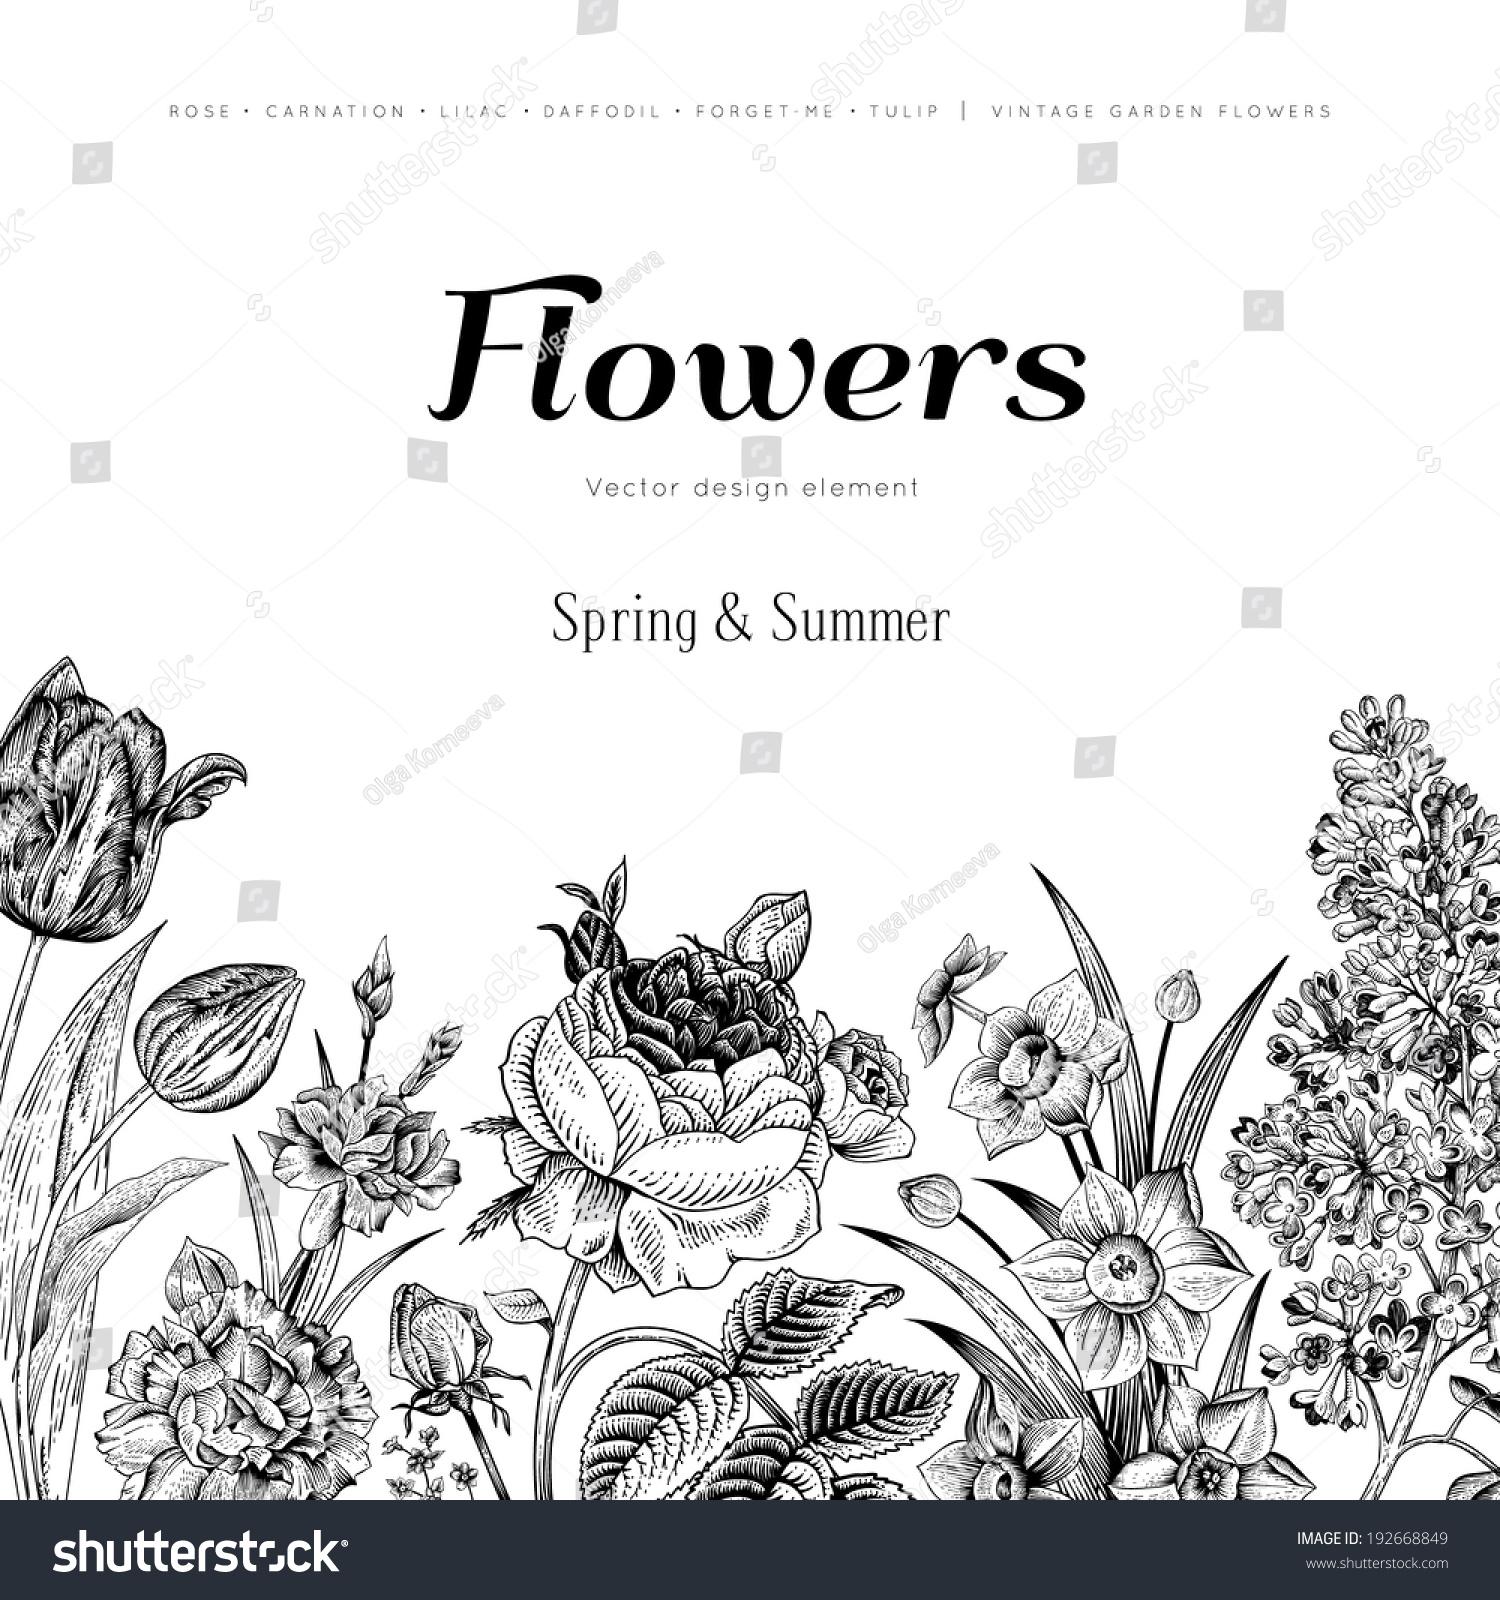 Summer Floral Vintage Vector Background Blossoming Stock Vector 192668849 - Shutterstock